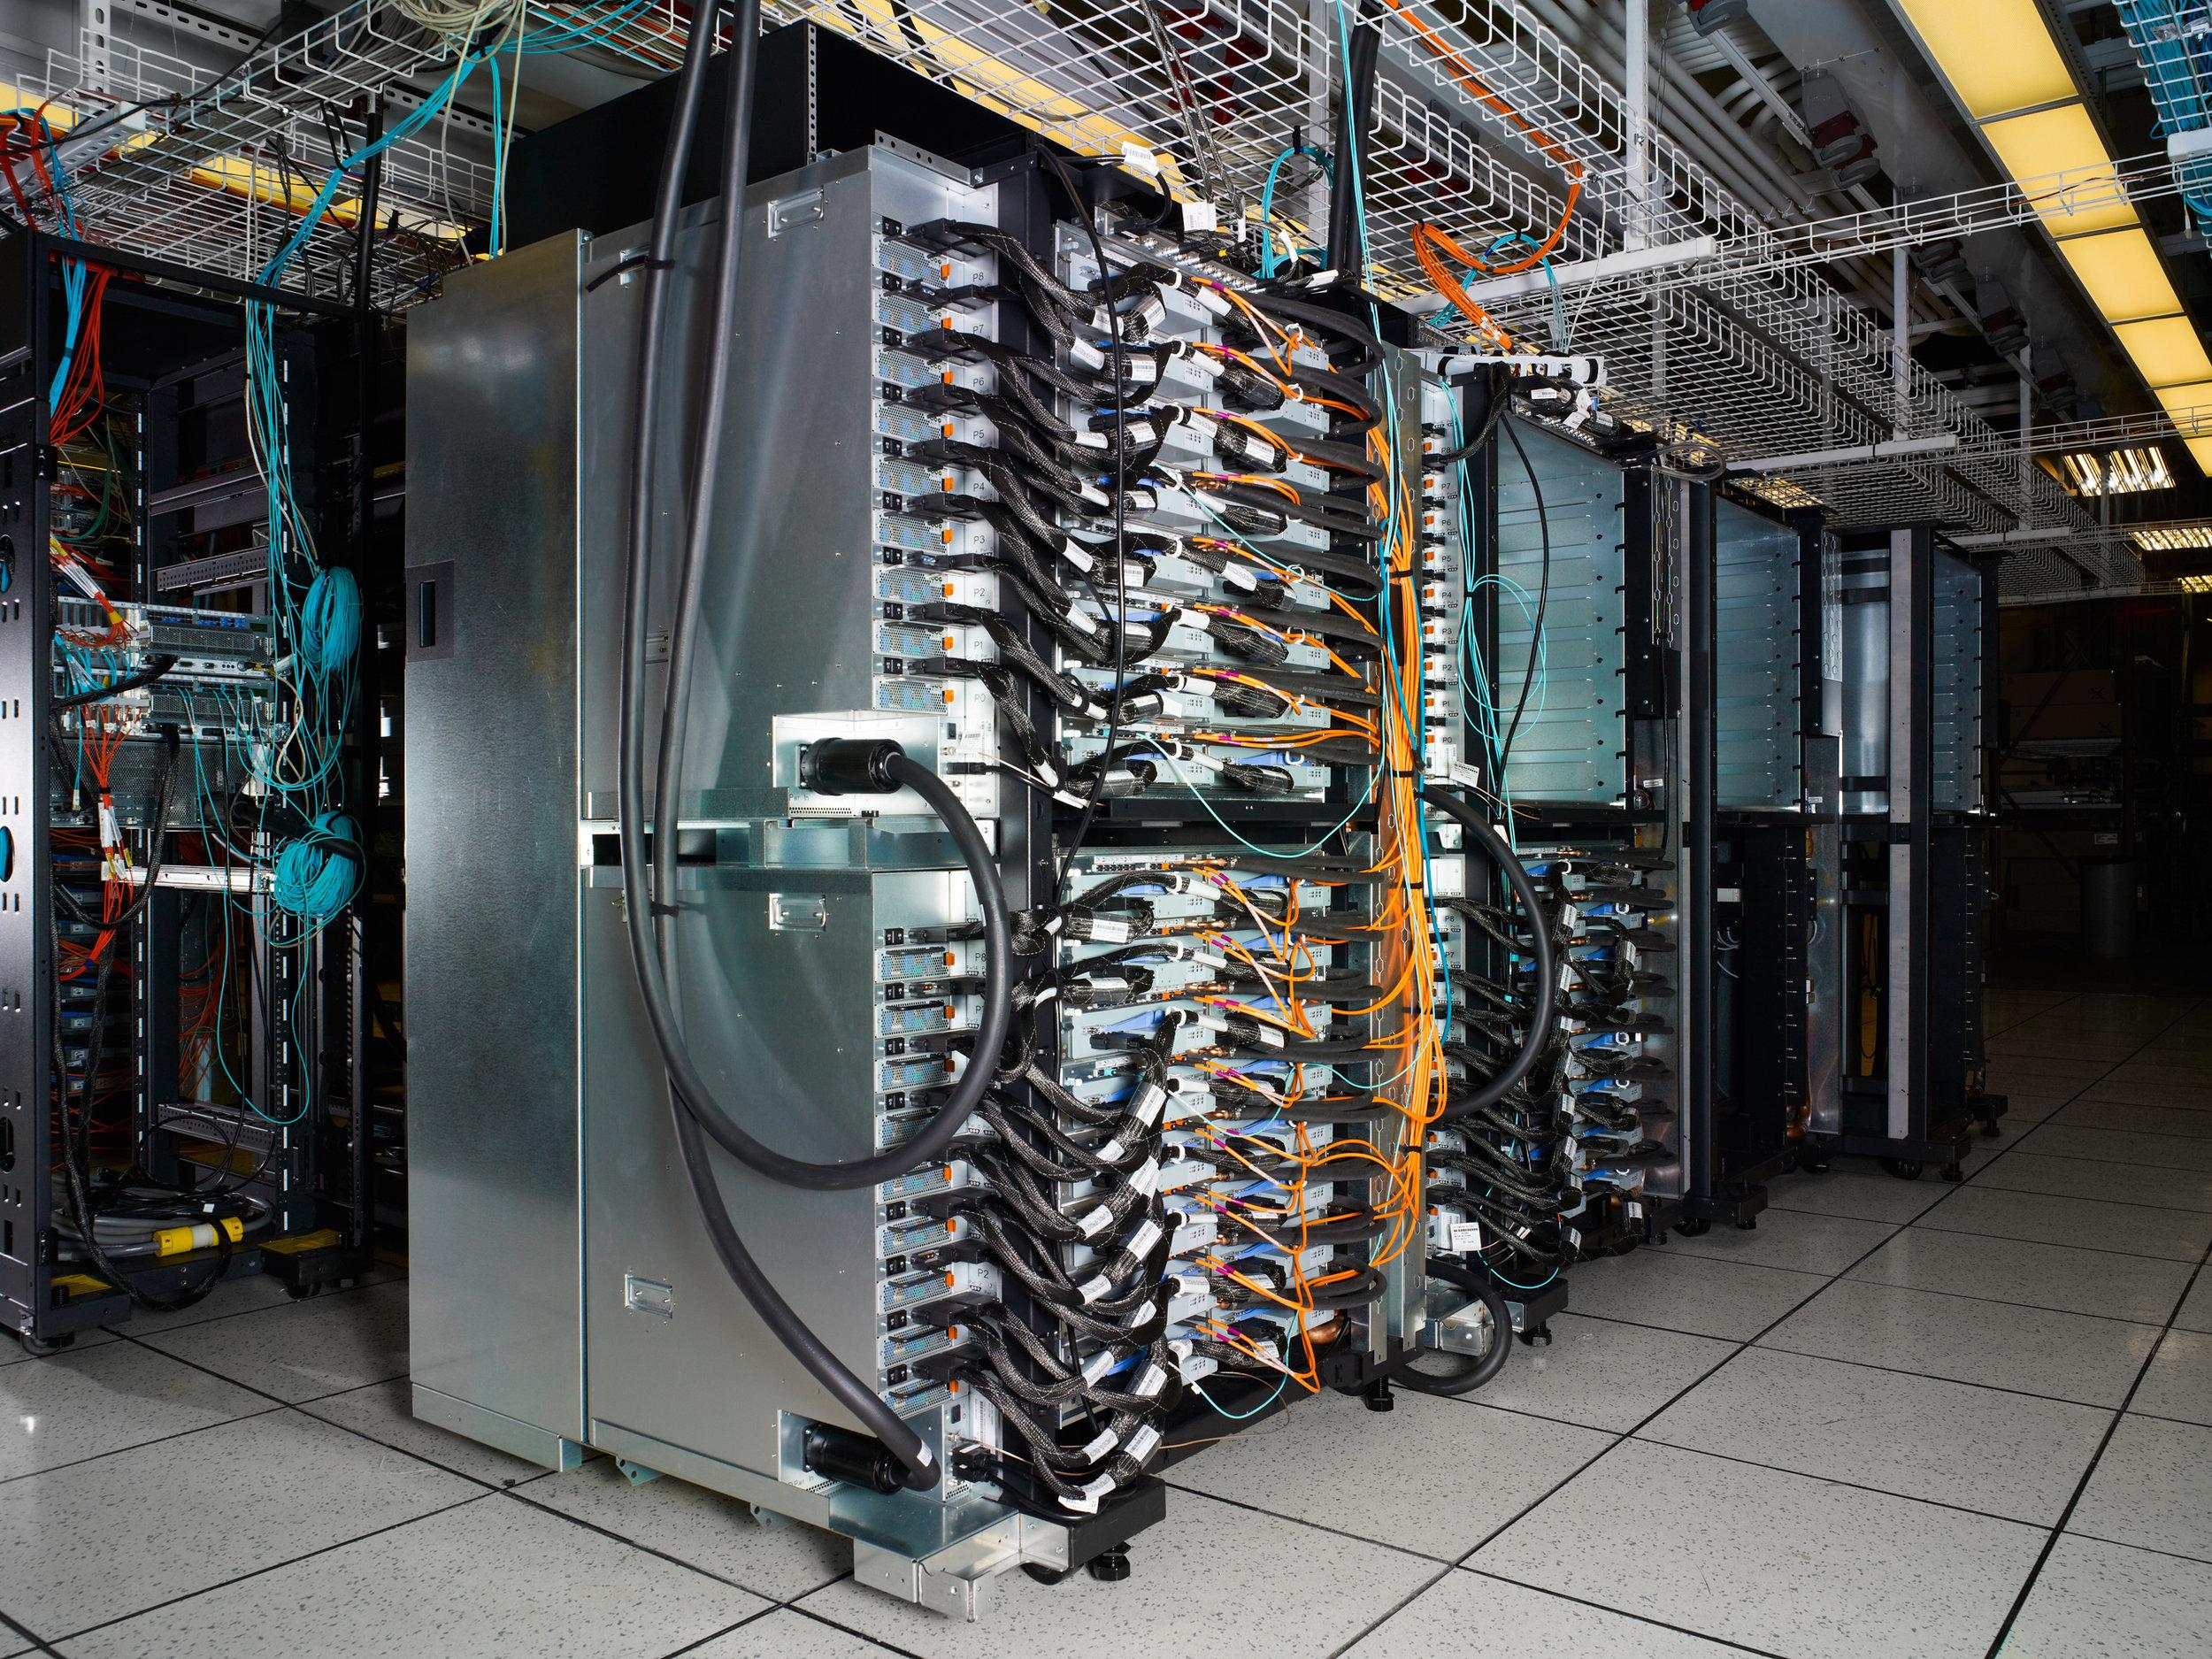 IBM-Rochester_tether-48178.jpg